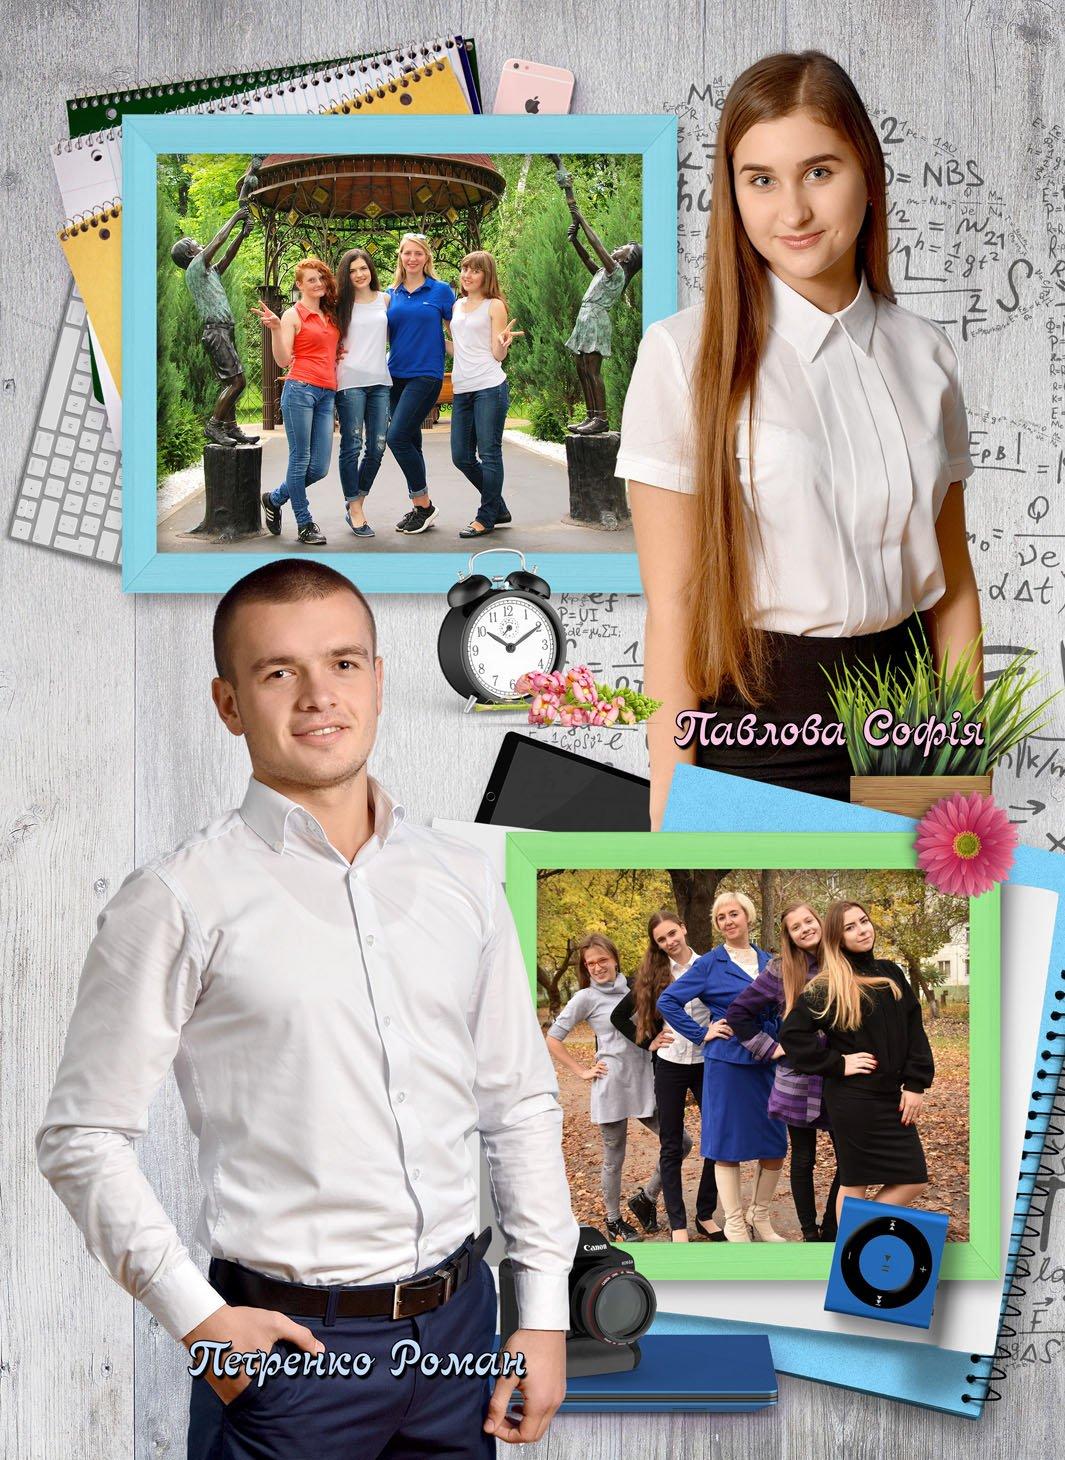 https://school-photo.com.ua/wp-content/uploads/2017/09/02-copy-1.jpg